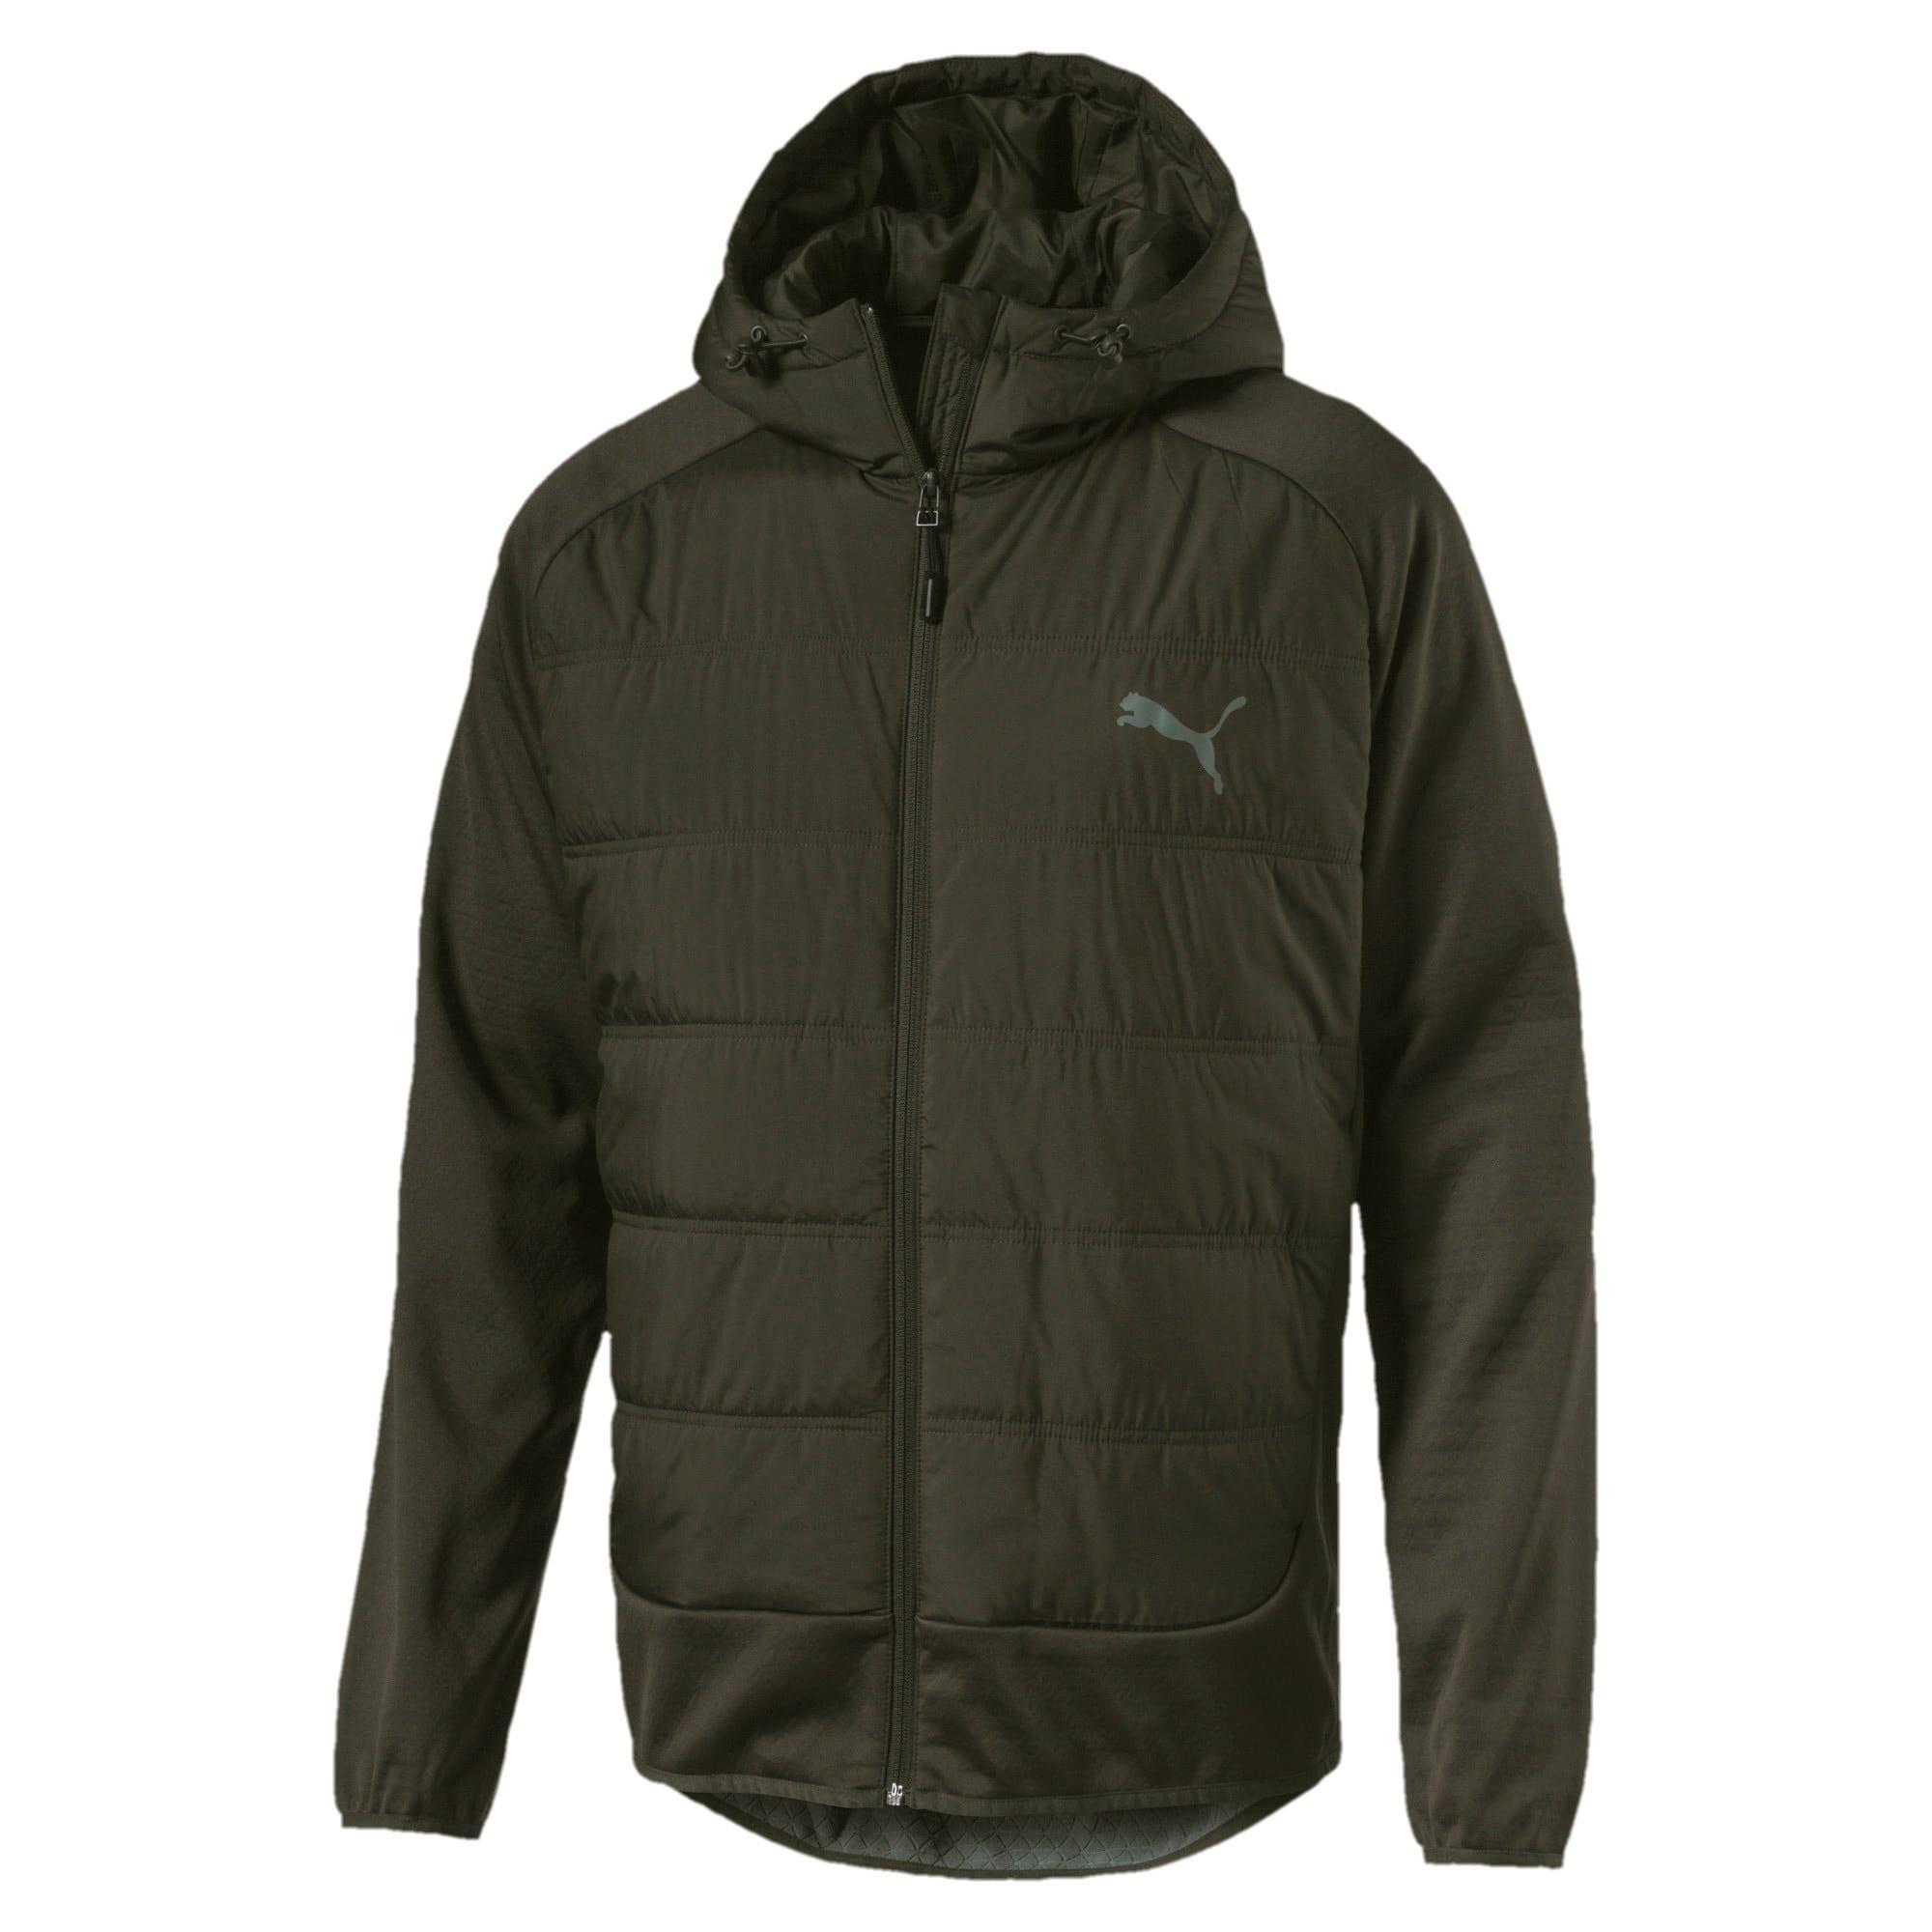 Thumbnail 1 of Hybrid Men's Padded Jacket, Forest Night, medium